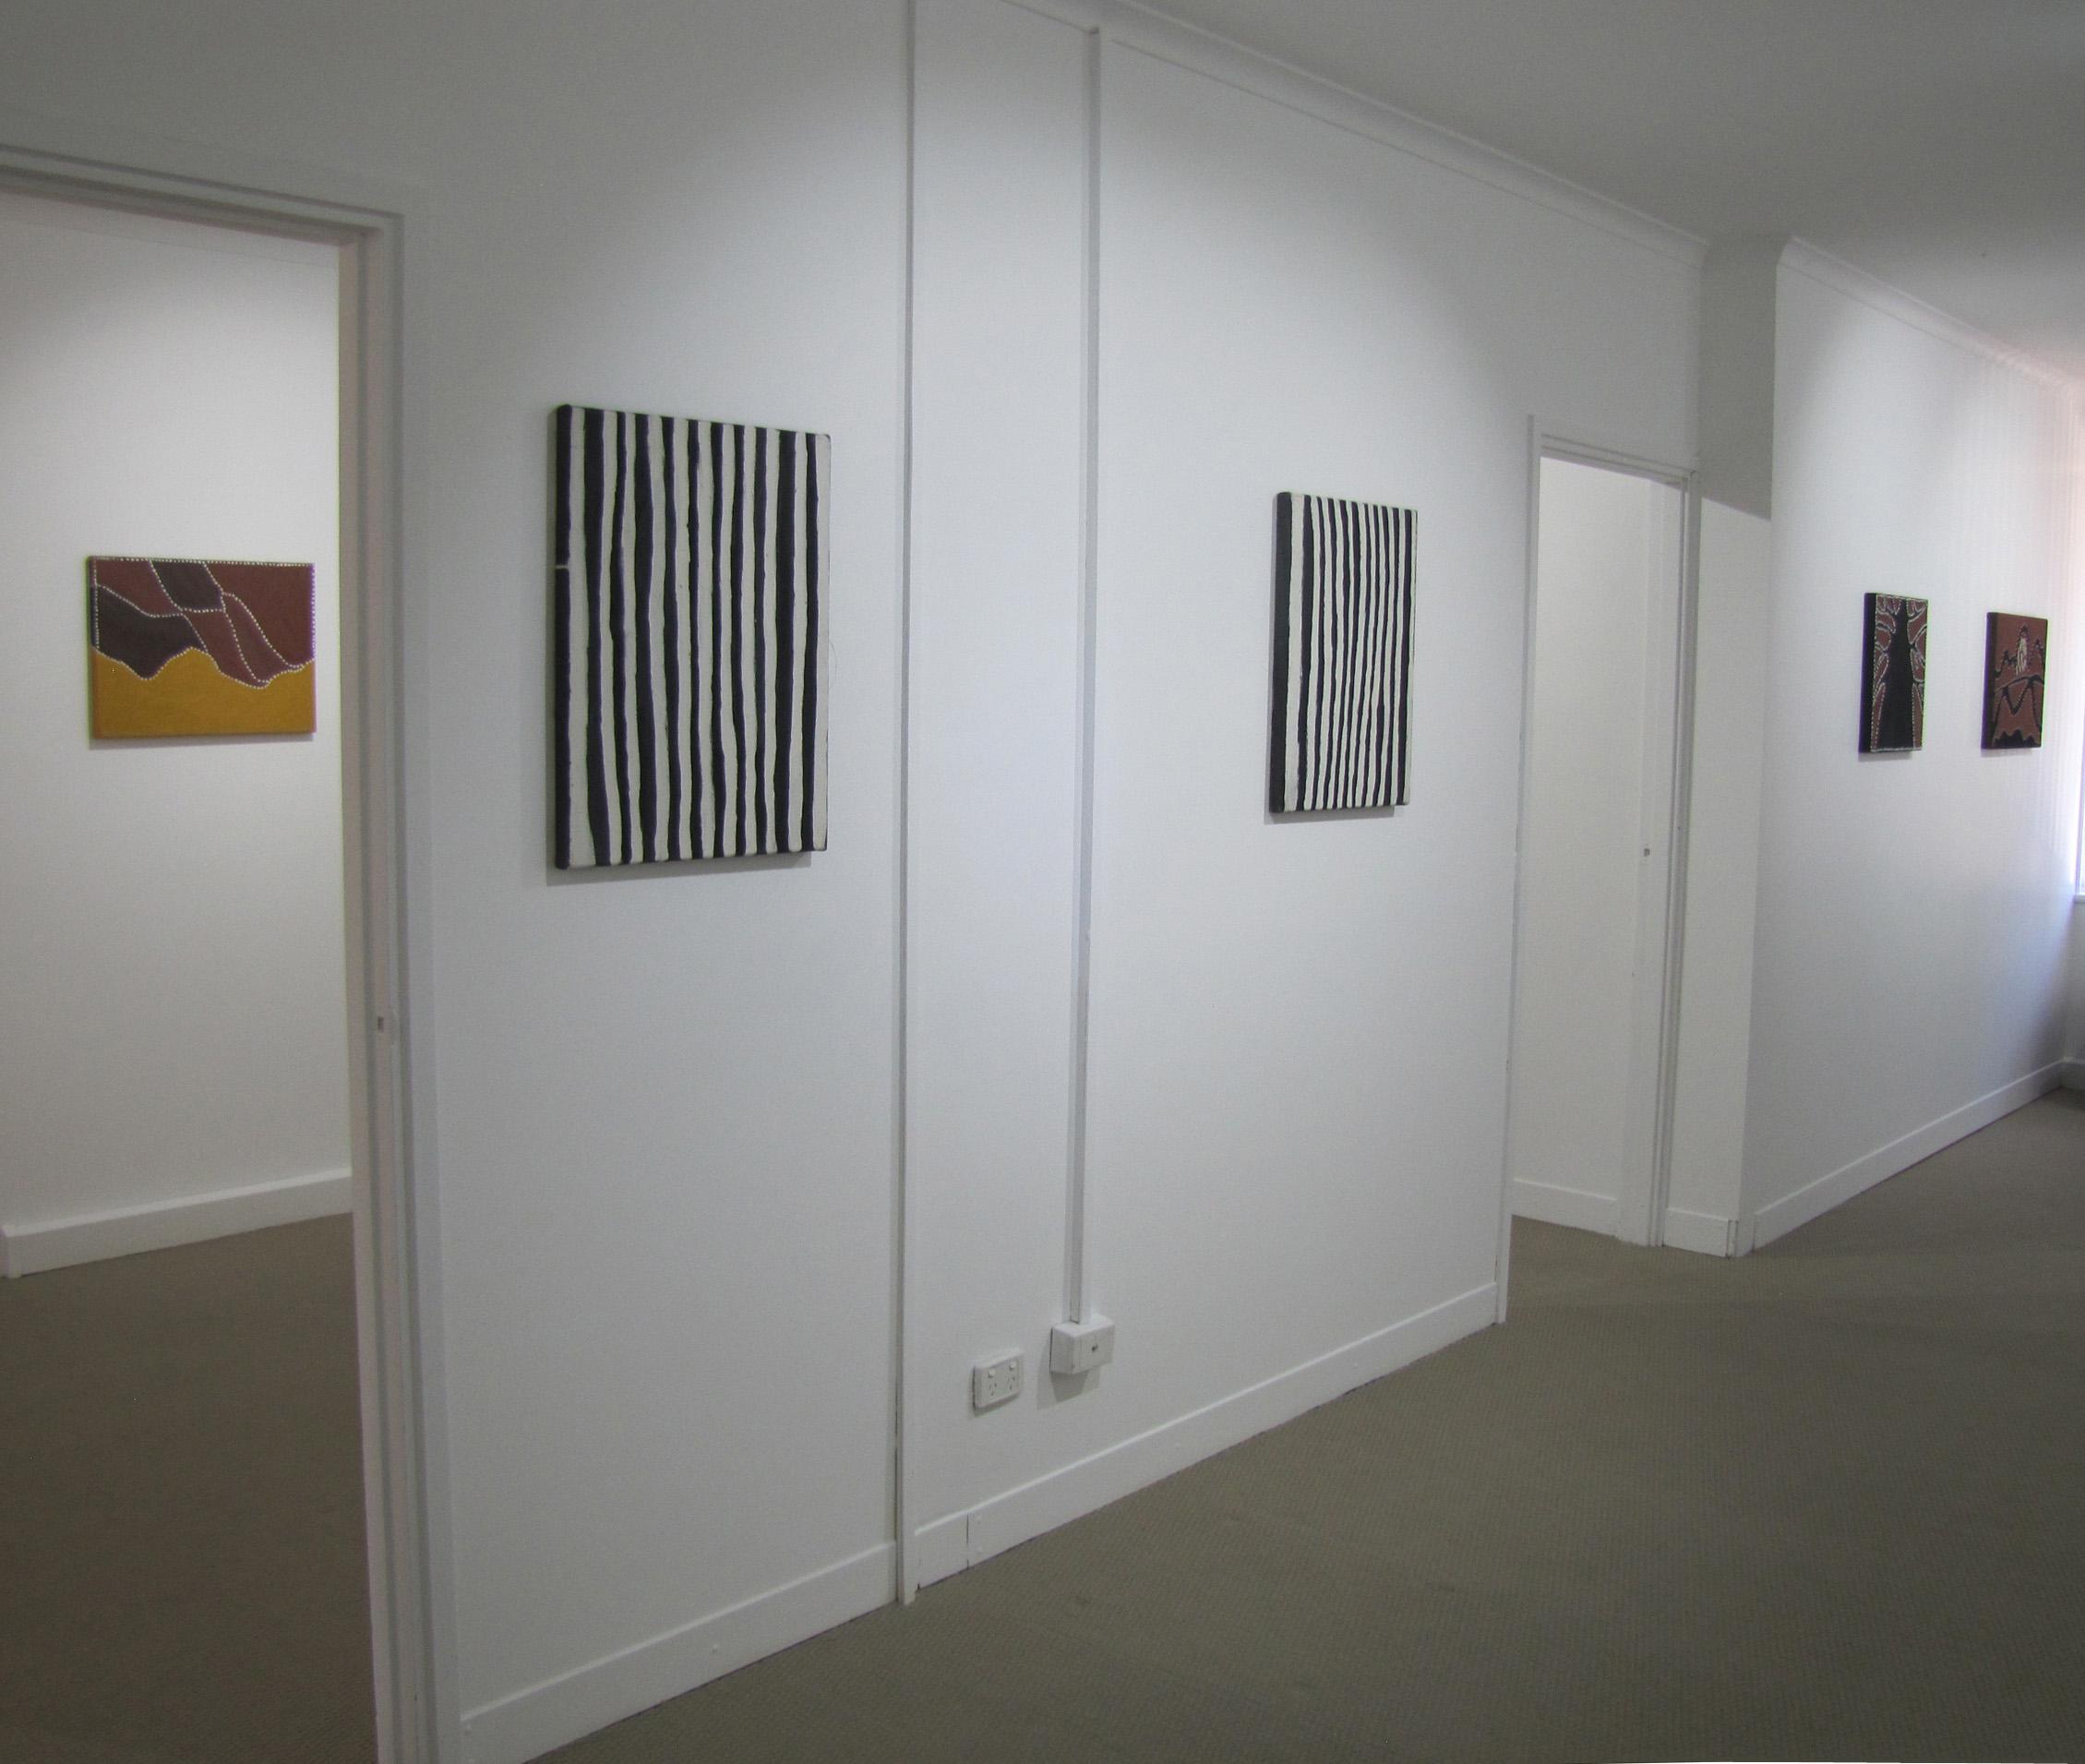 NSG. Warmun 4 exhibition. Exhibition views 2.jpg